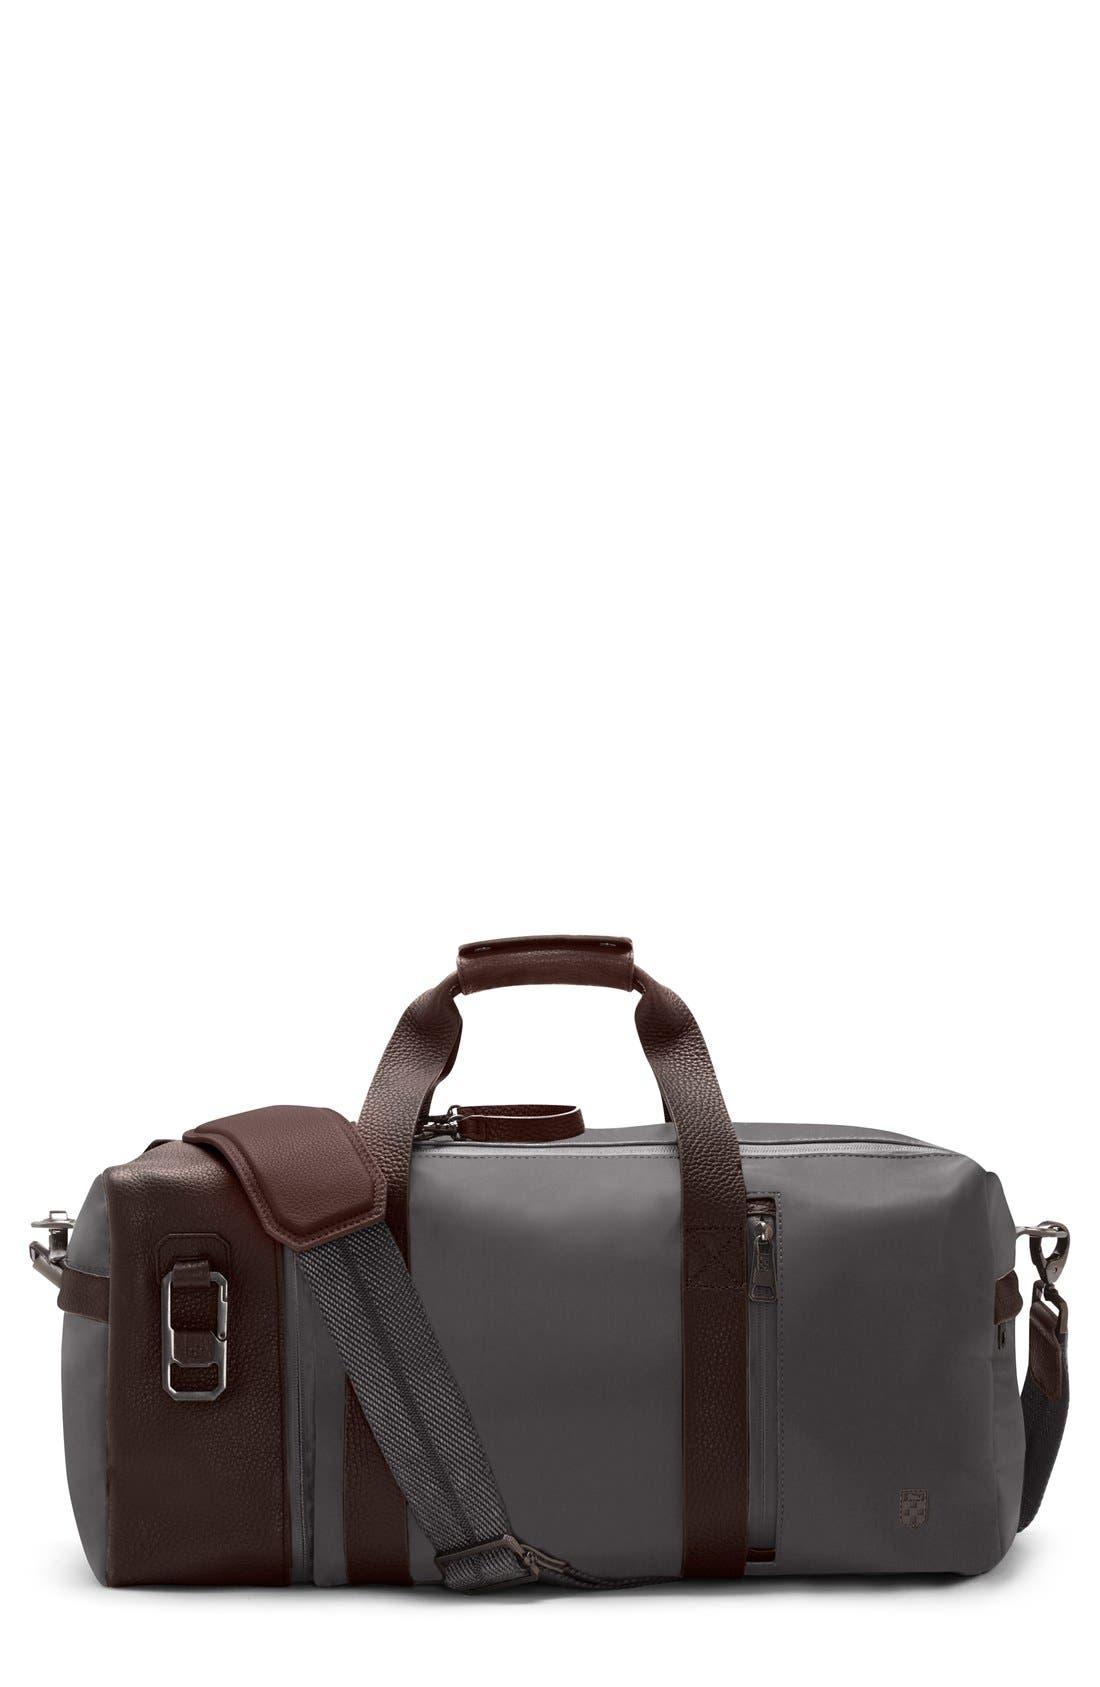 'Mestr' Duffel Bag,                         Main,                         color, 021